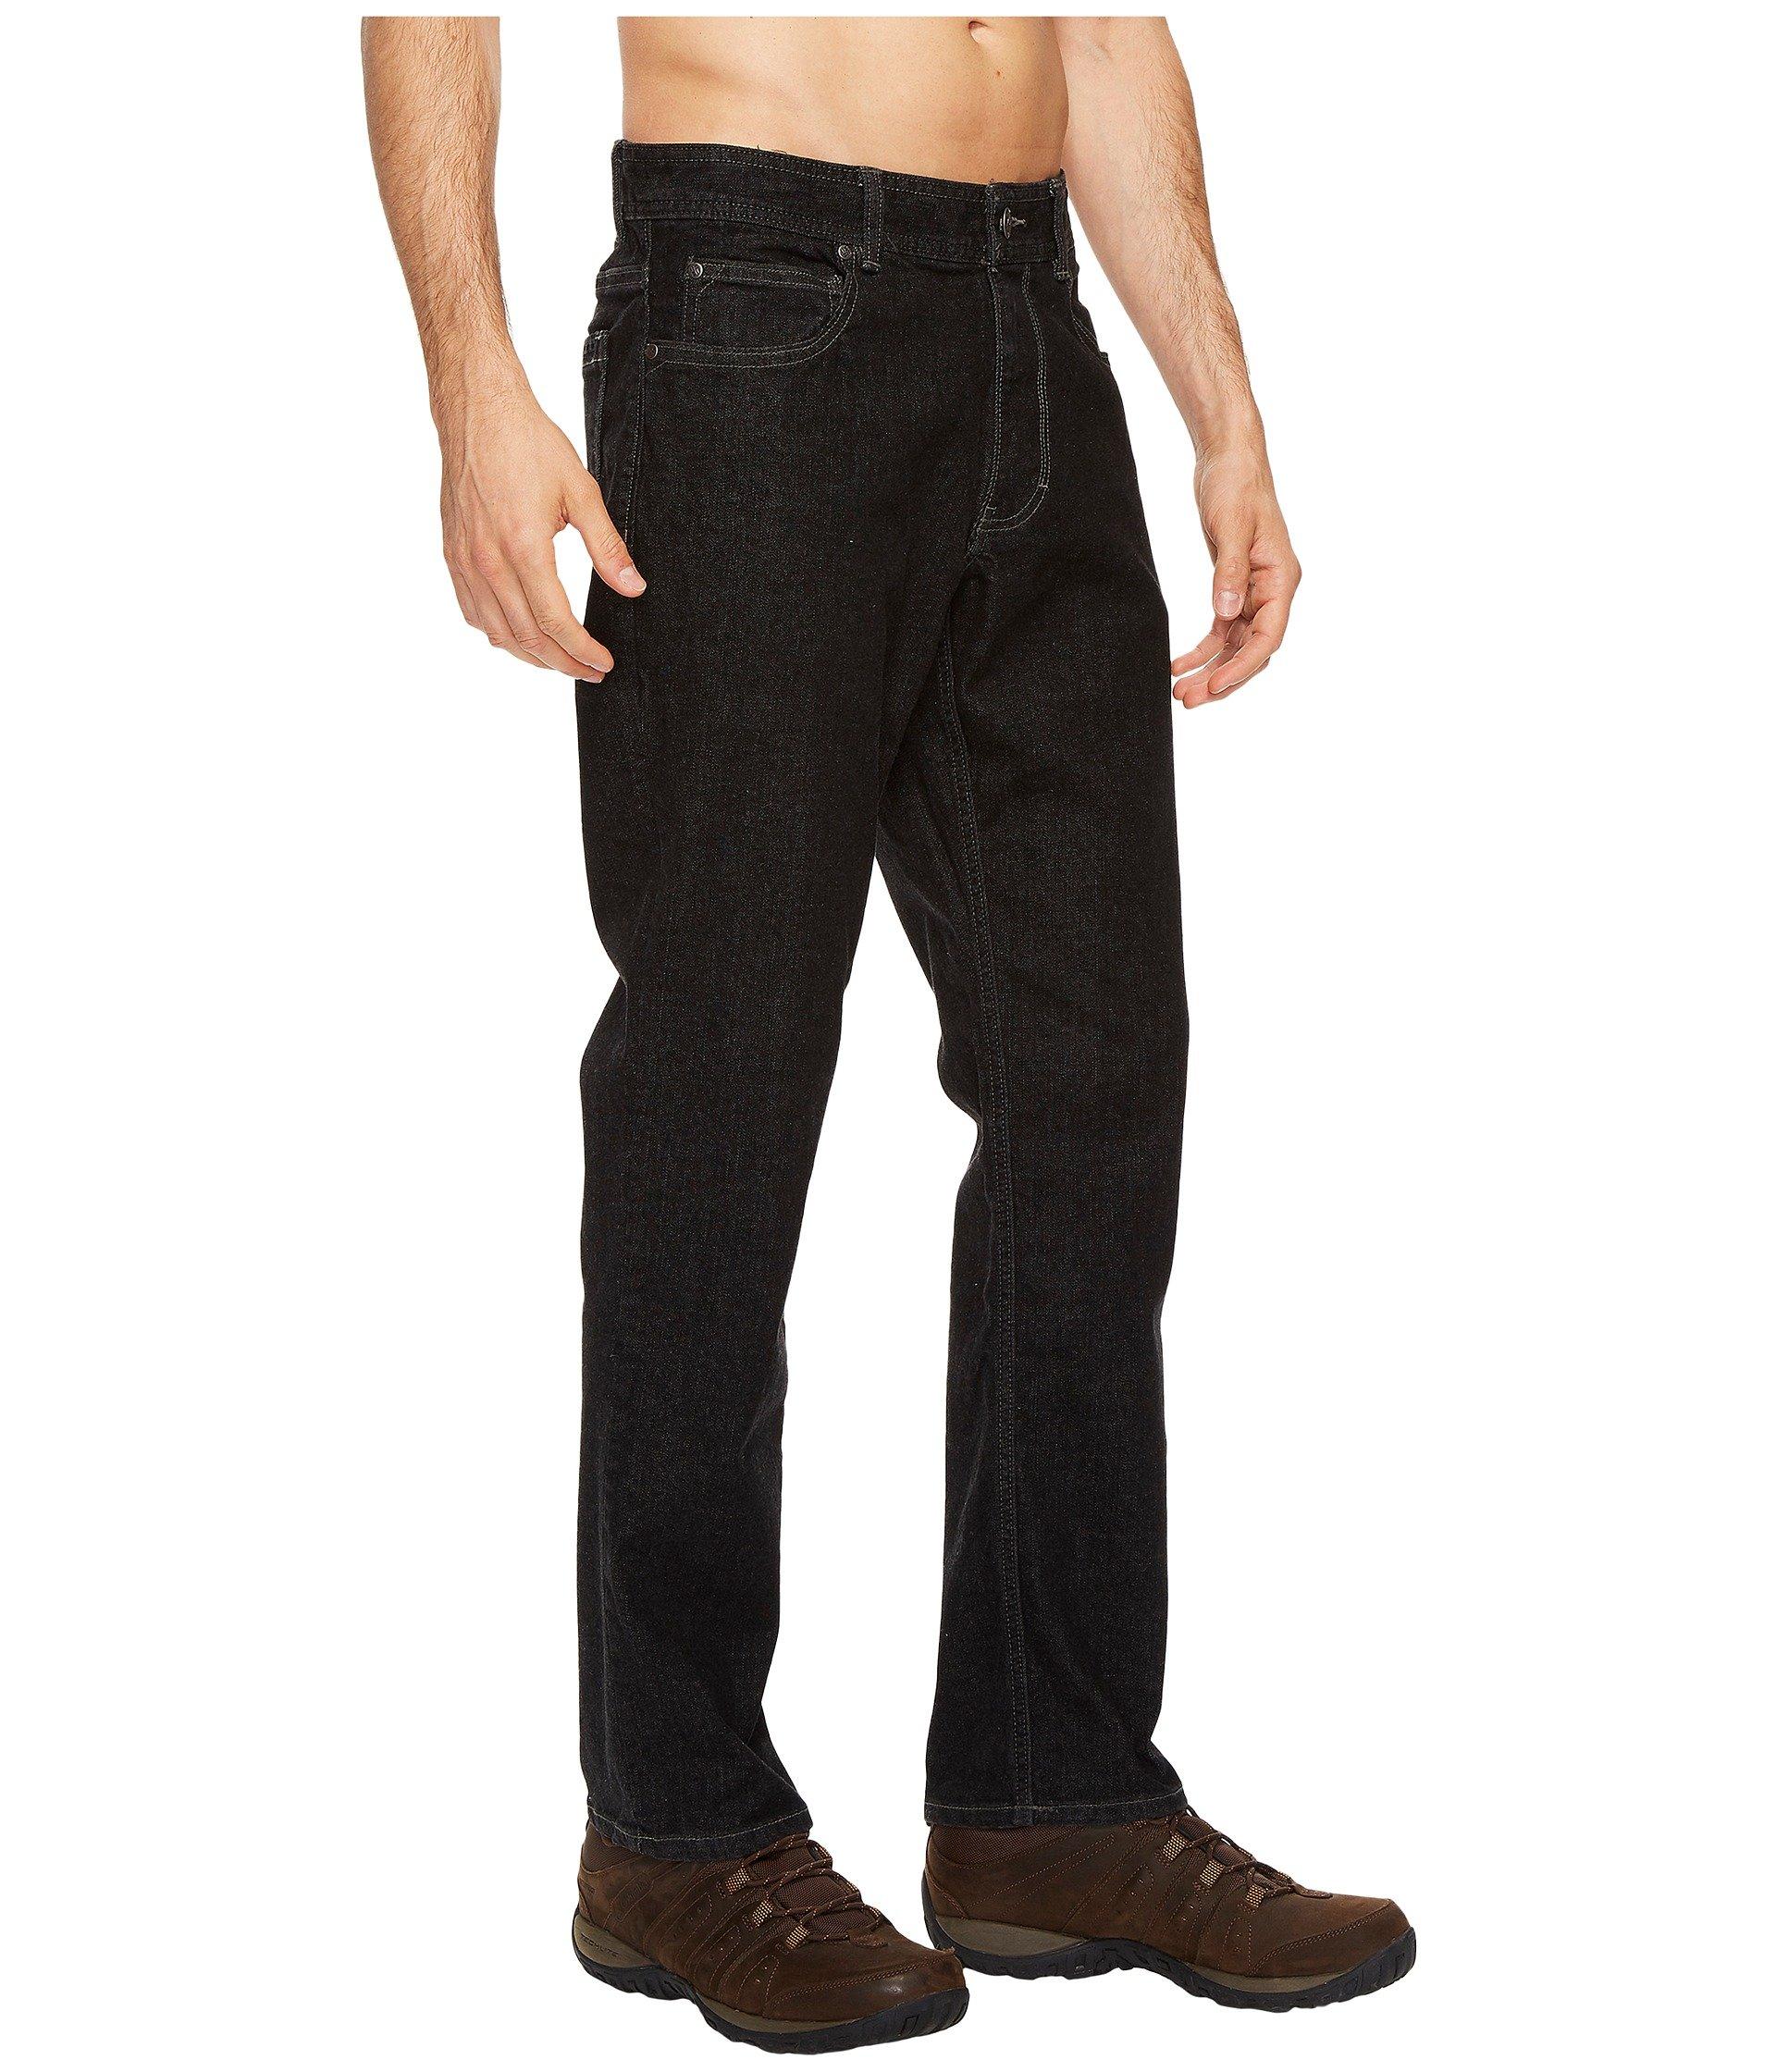 Black Pants Columbia Peak Pilot Denim Sg4wOCzn